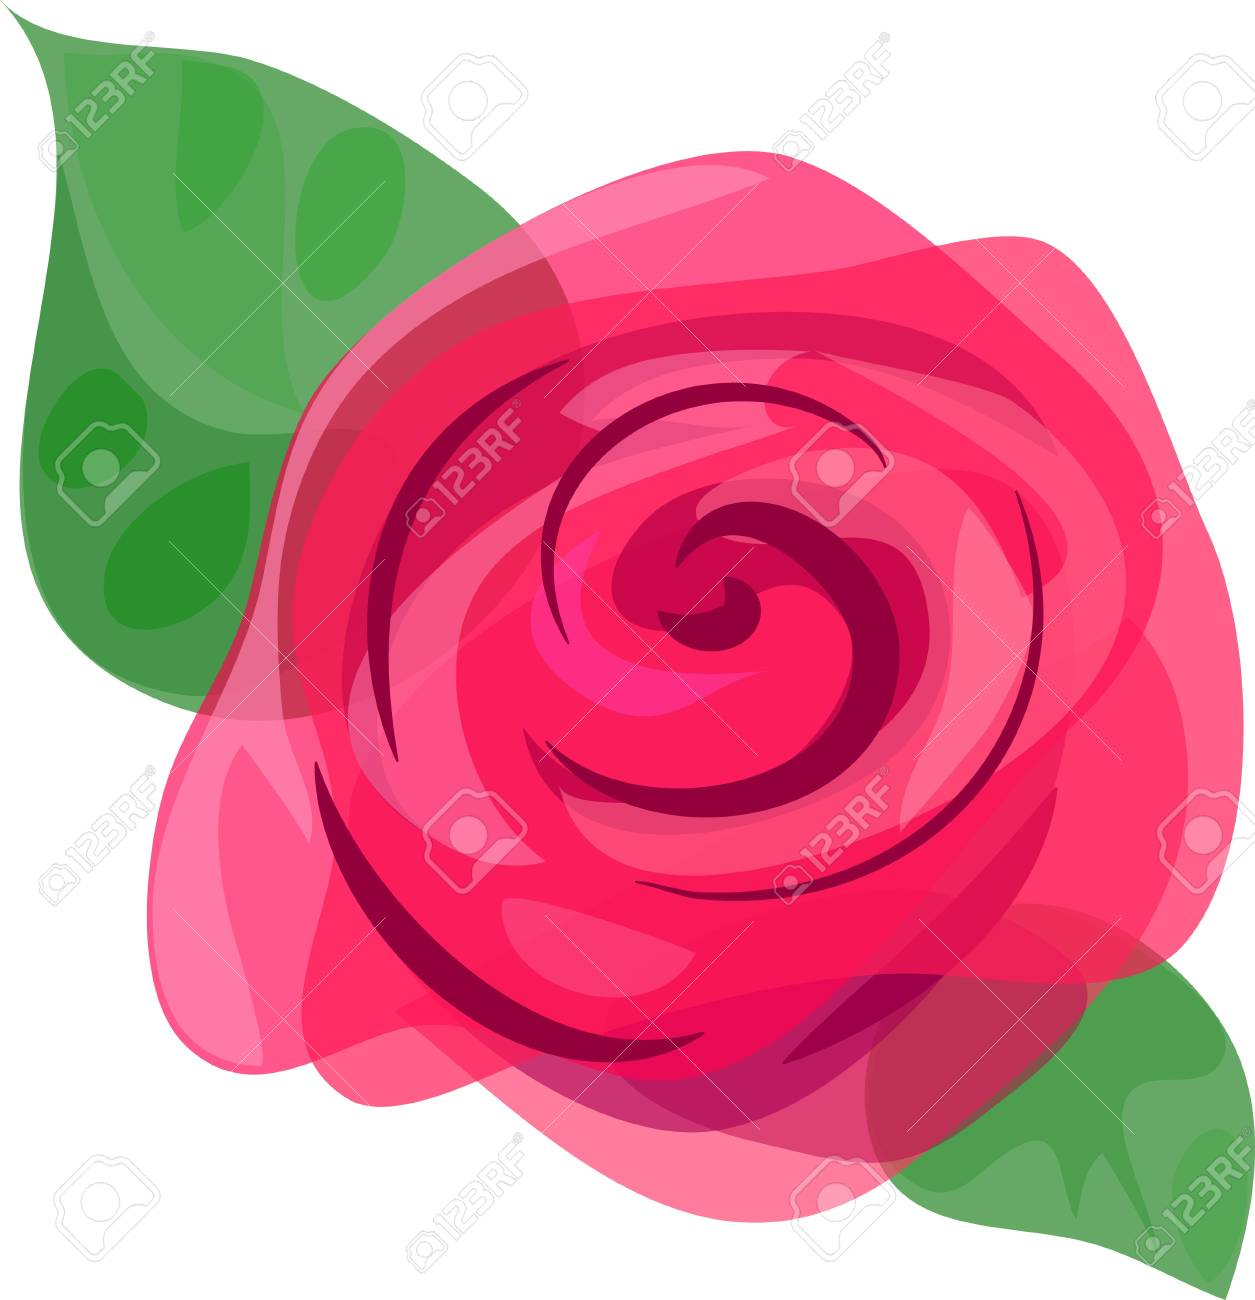 Beautiful picturesque rose Stock Vector - 12482488